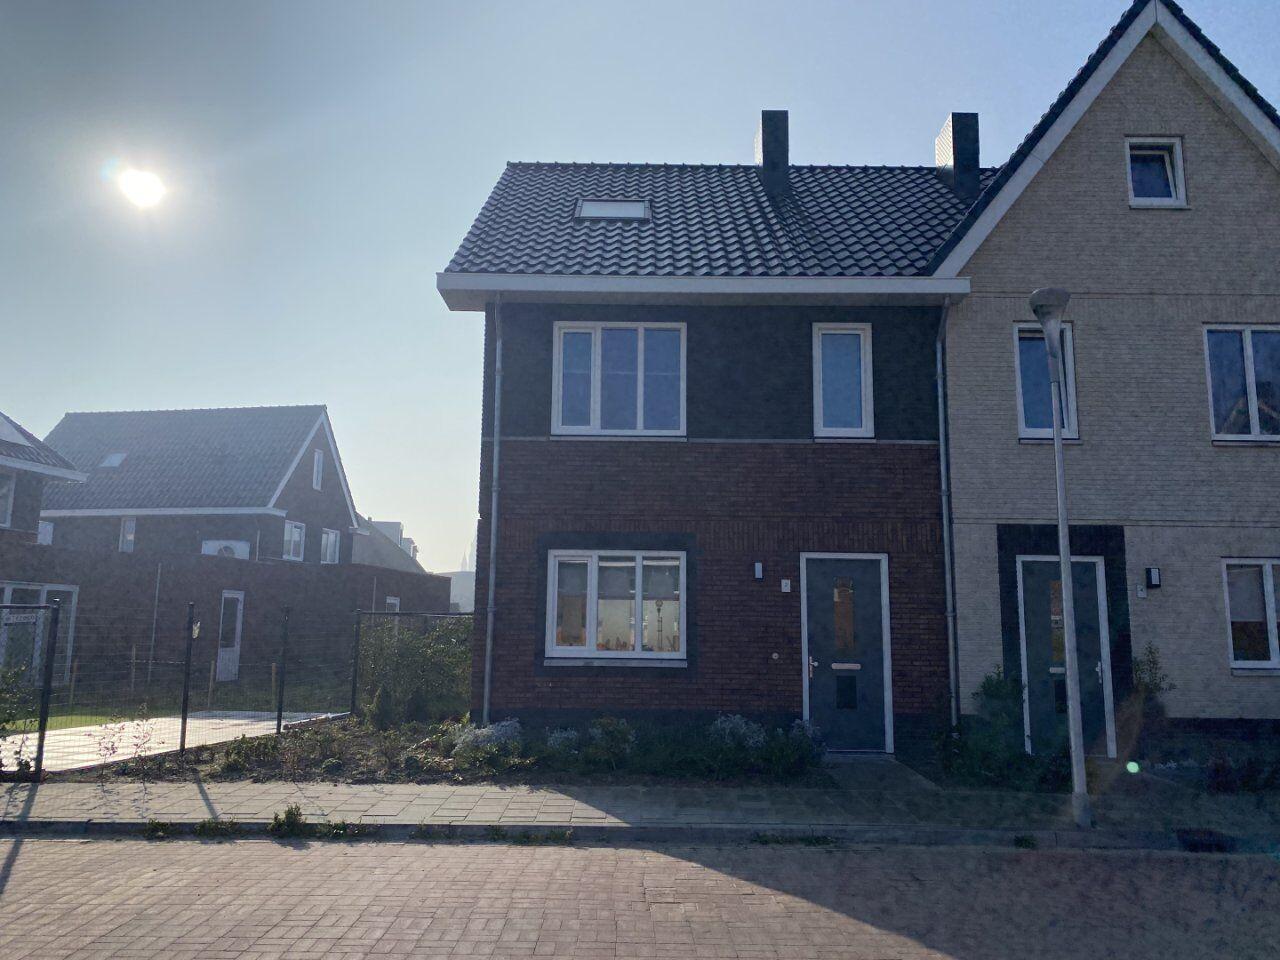 7189-lunet_2-steenbergen-870375628